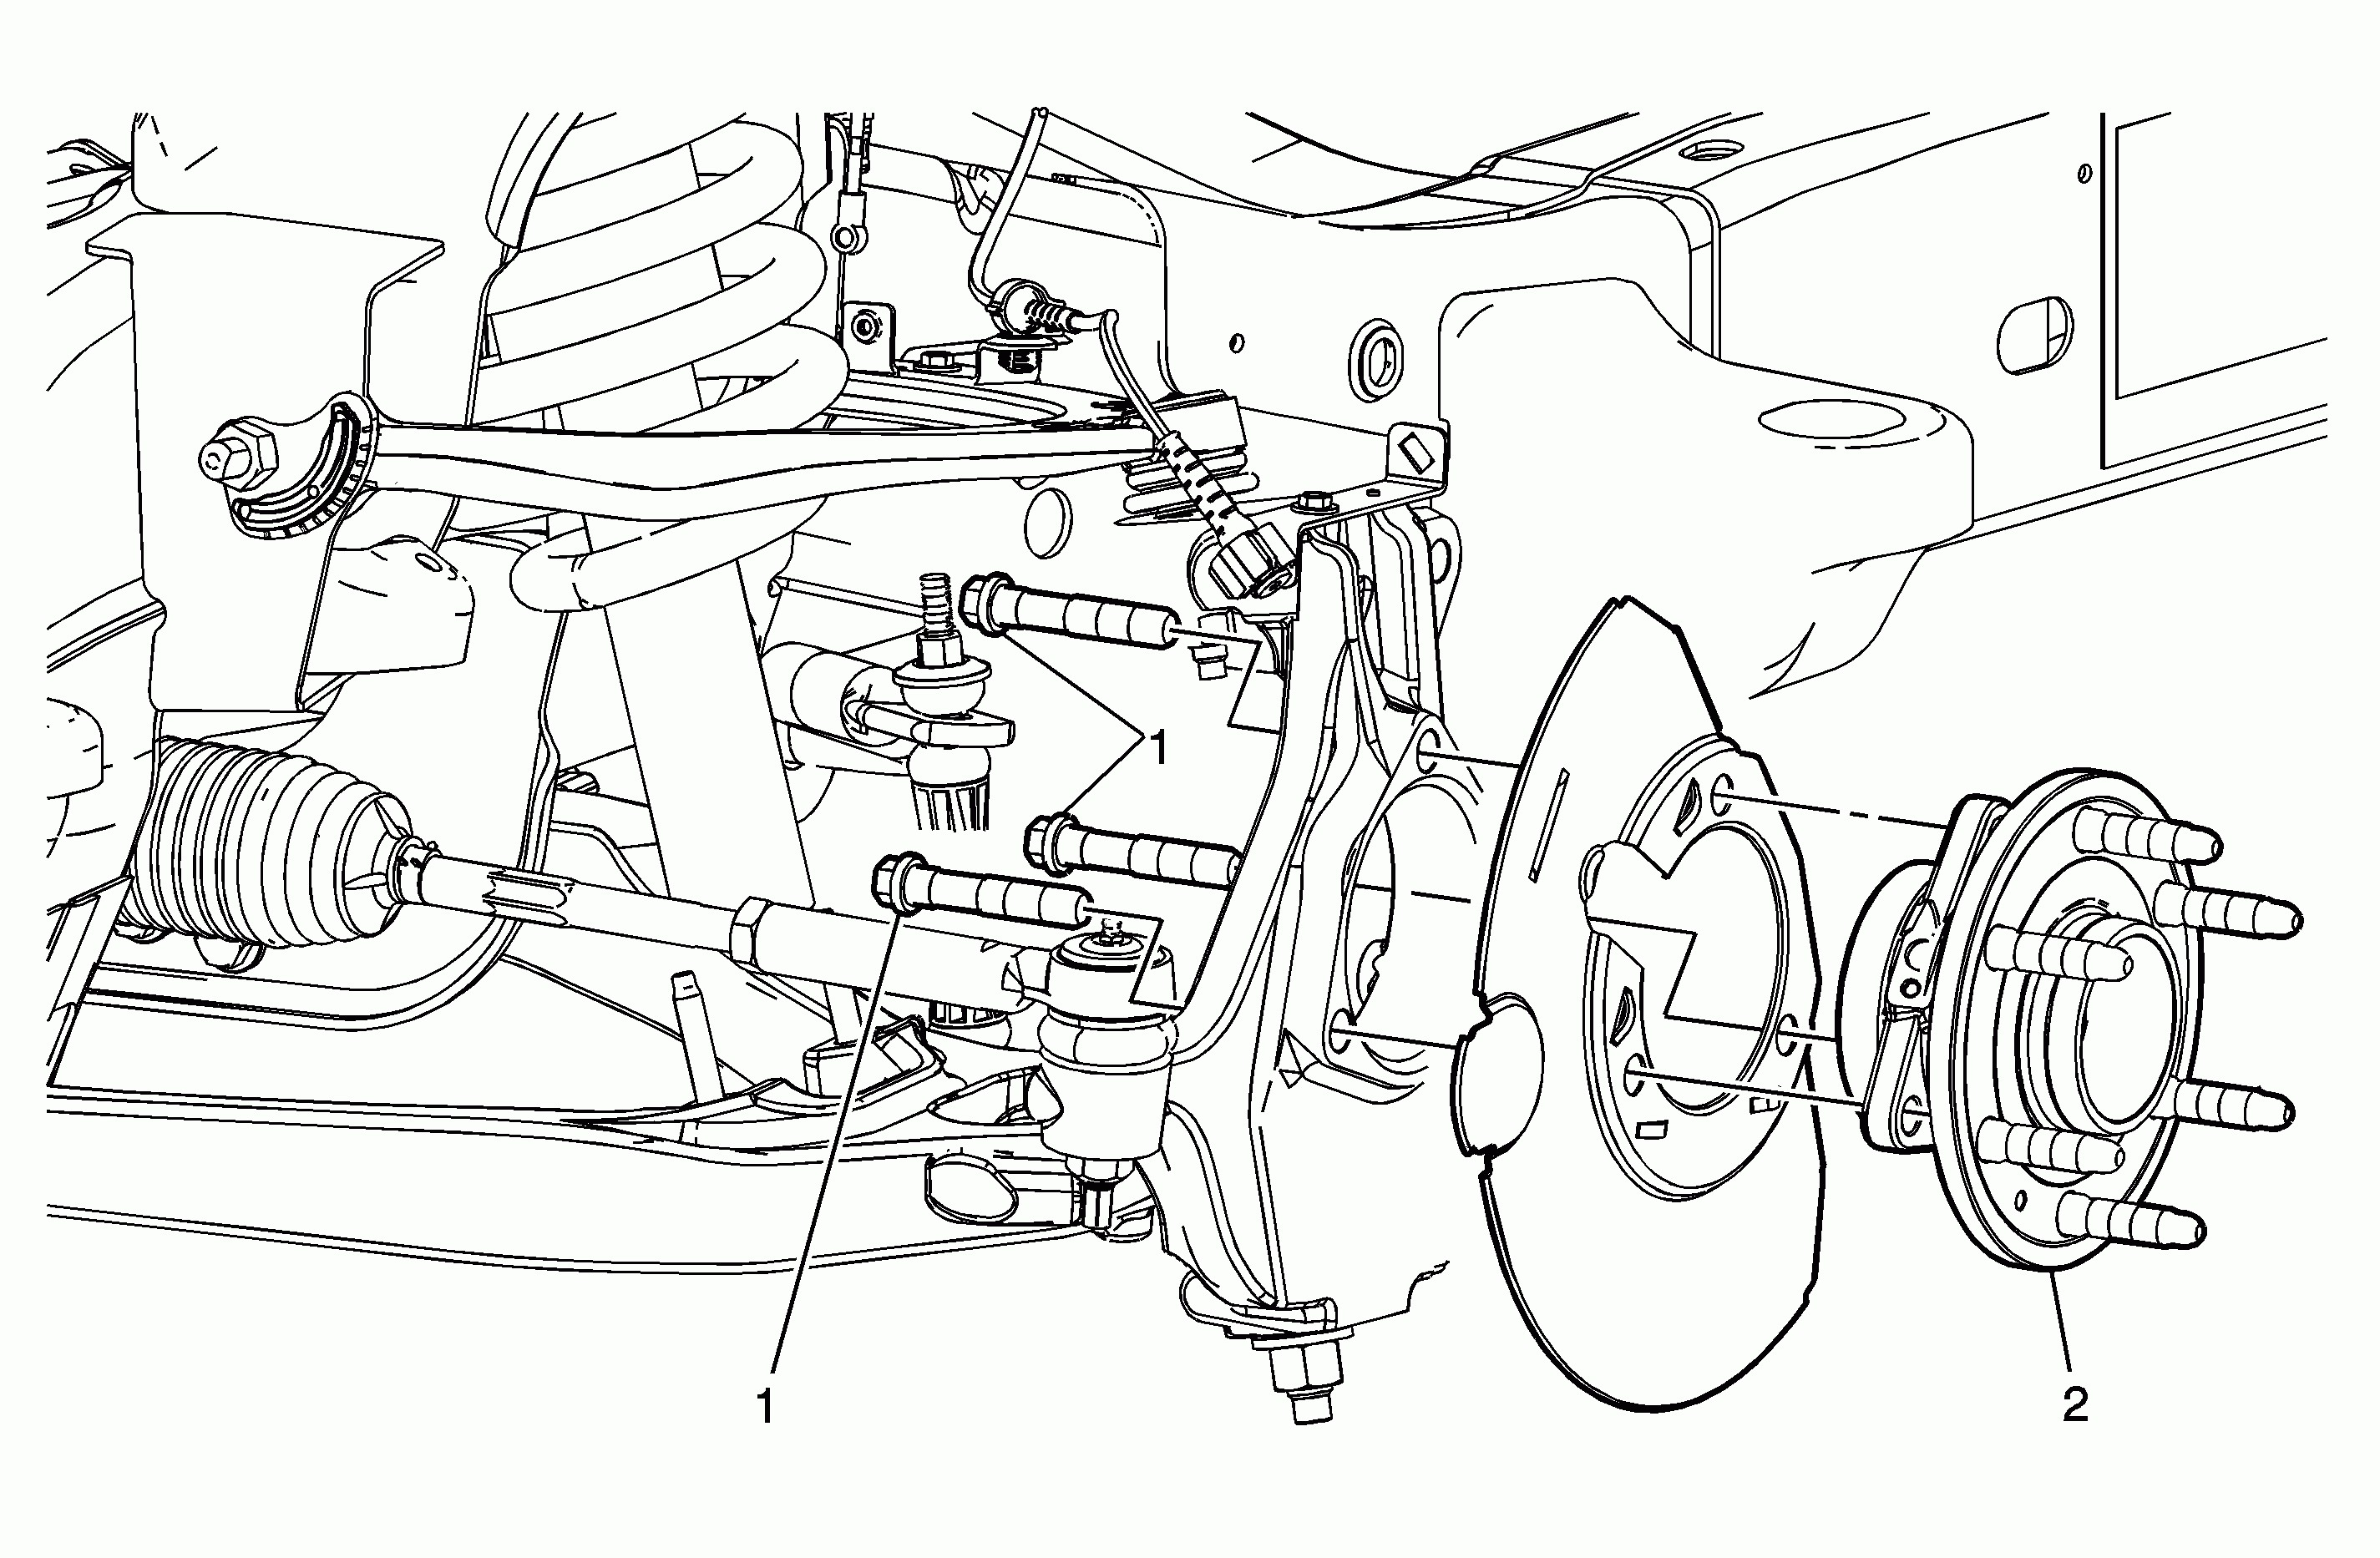 Chevy Truck Parts Diagram Parts Diagram Moreover Chevy Tahoe Door Parts Diagram Tahoe Front Of Chevy Truck Parts Diagram